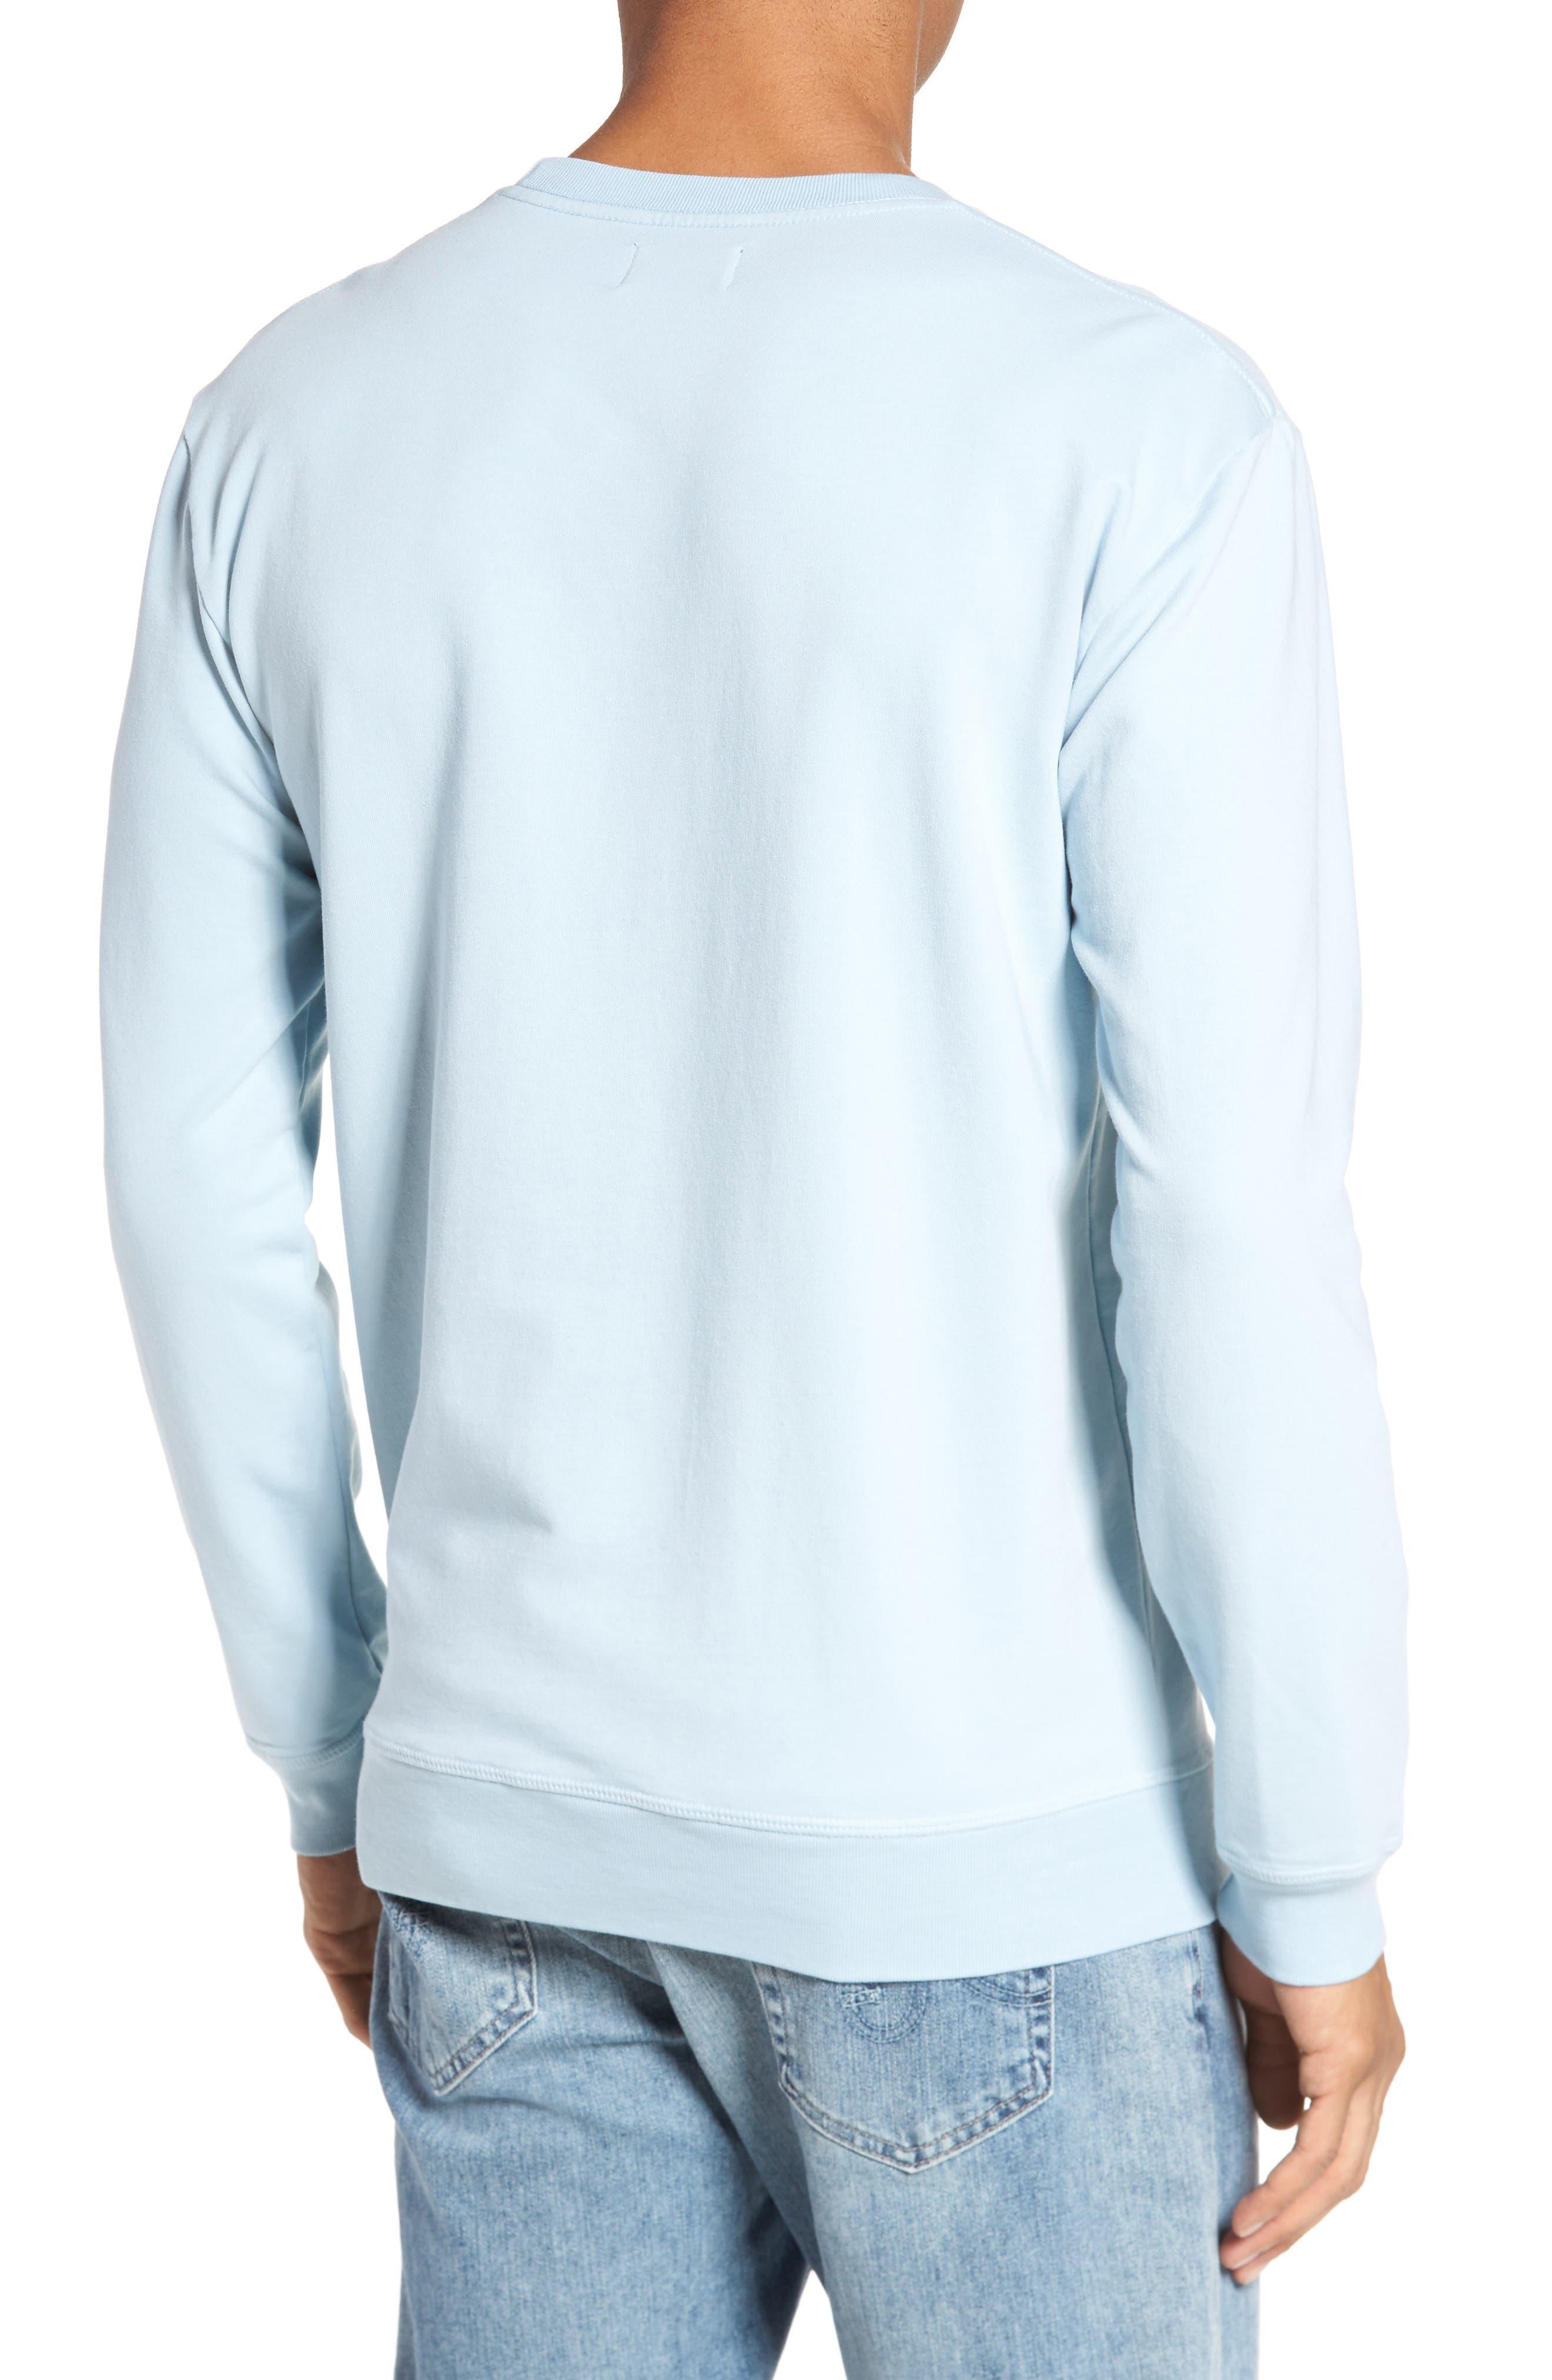 Alternate Image 2  - Goodlife Slim Fit Crewneck Sweatshirt